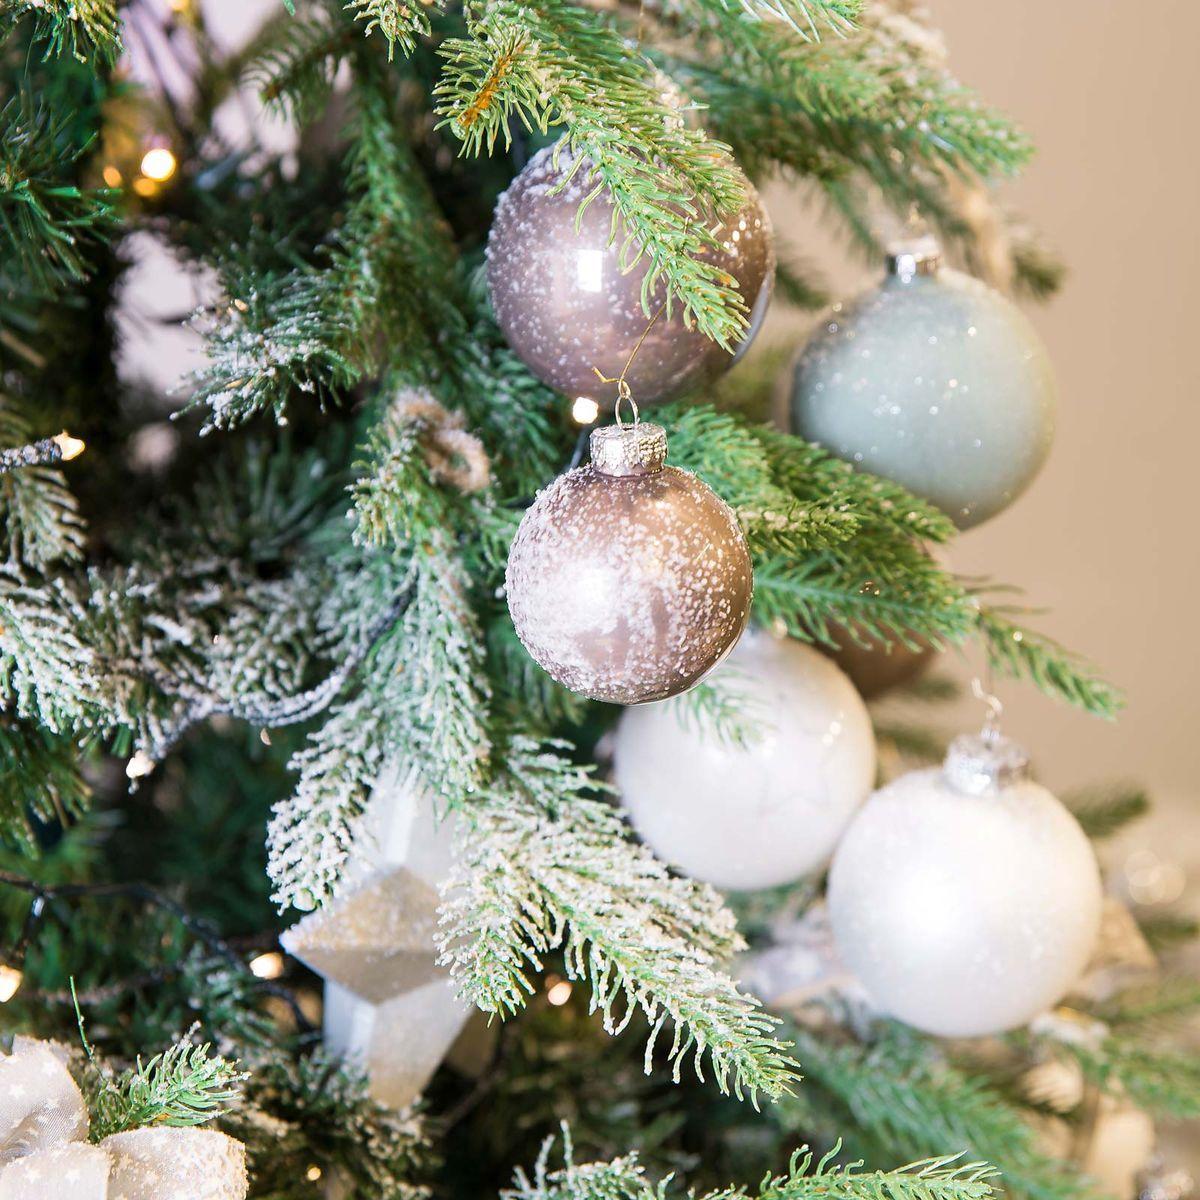 Kugelbox D 6cm 12er Set Altrosa Rosa Weihnachtsbaum Weihnachsbaum Schmucken Weihnachtsbaum